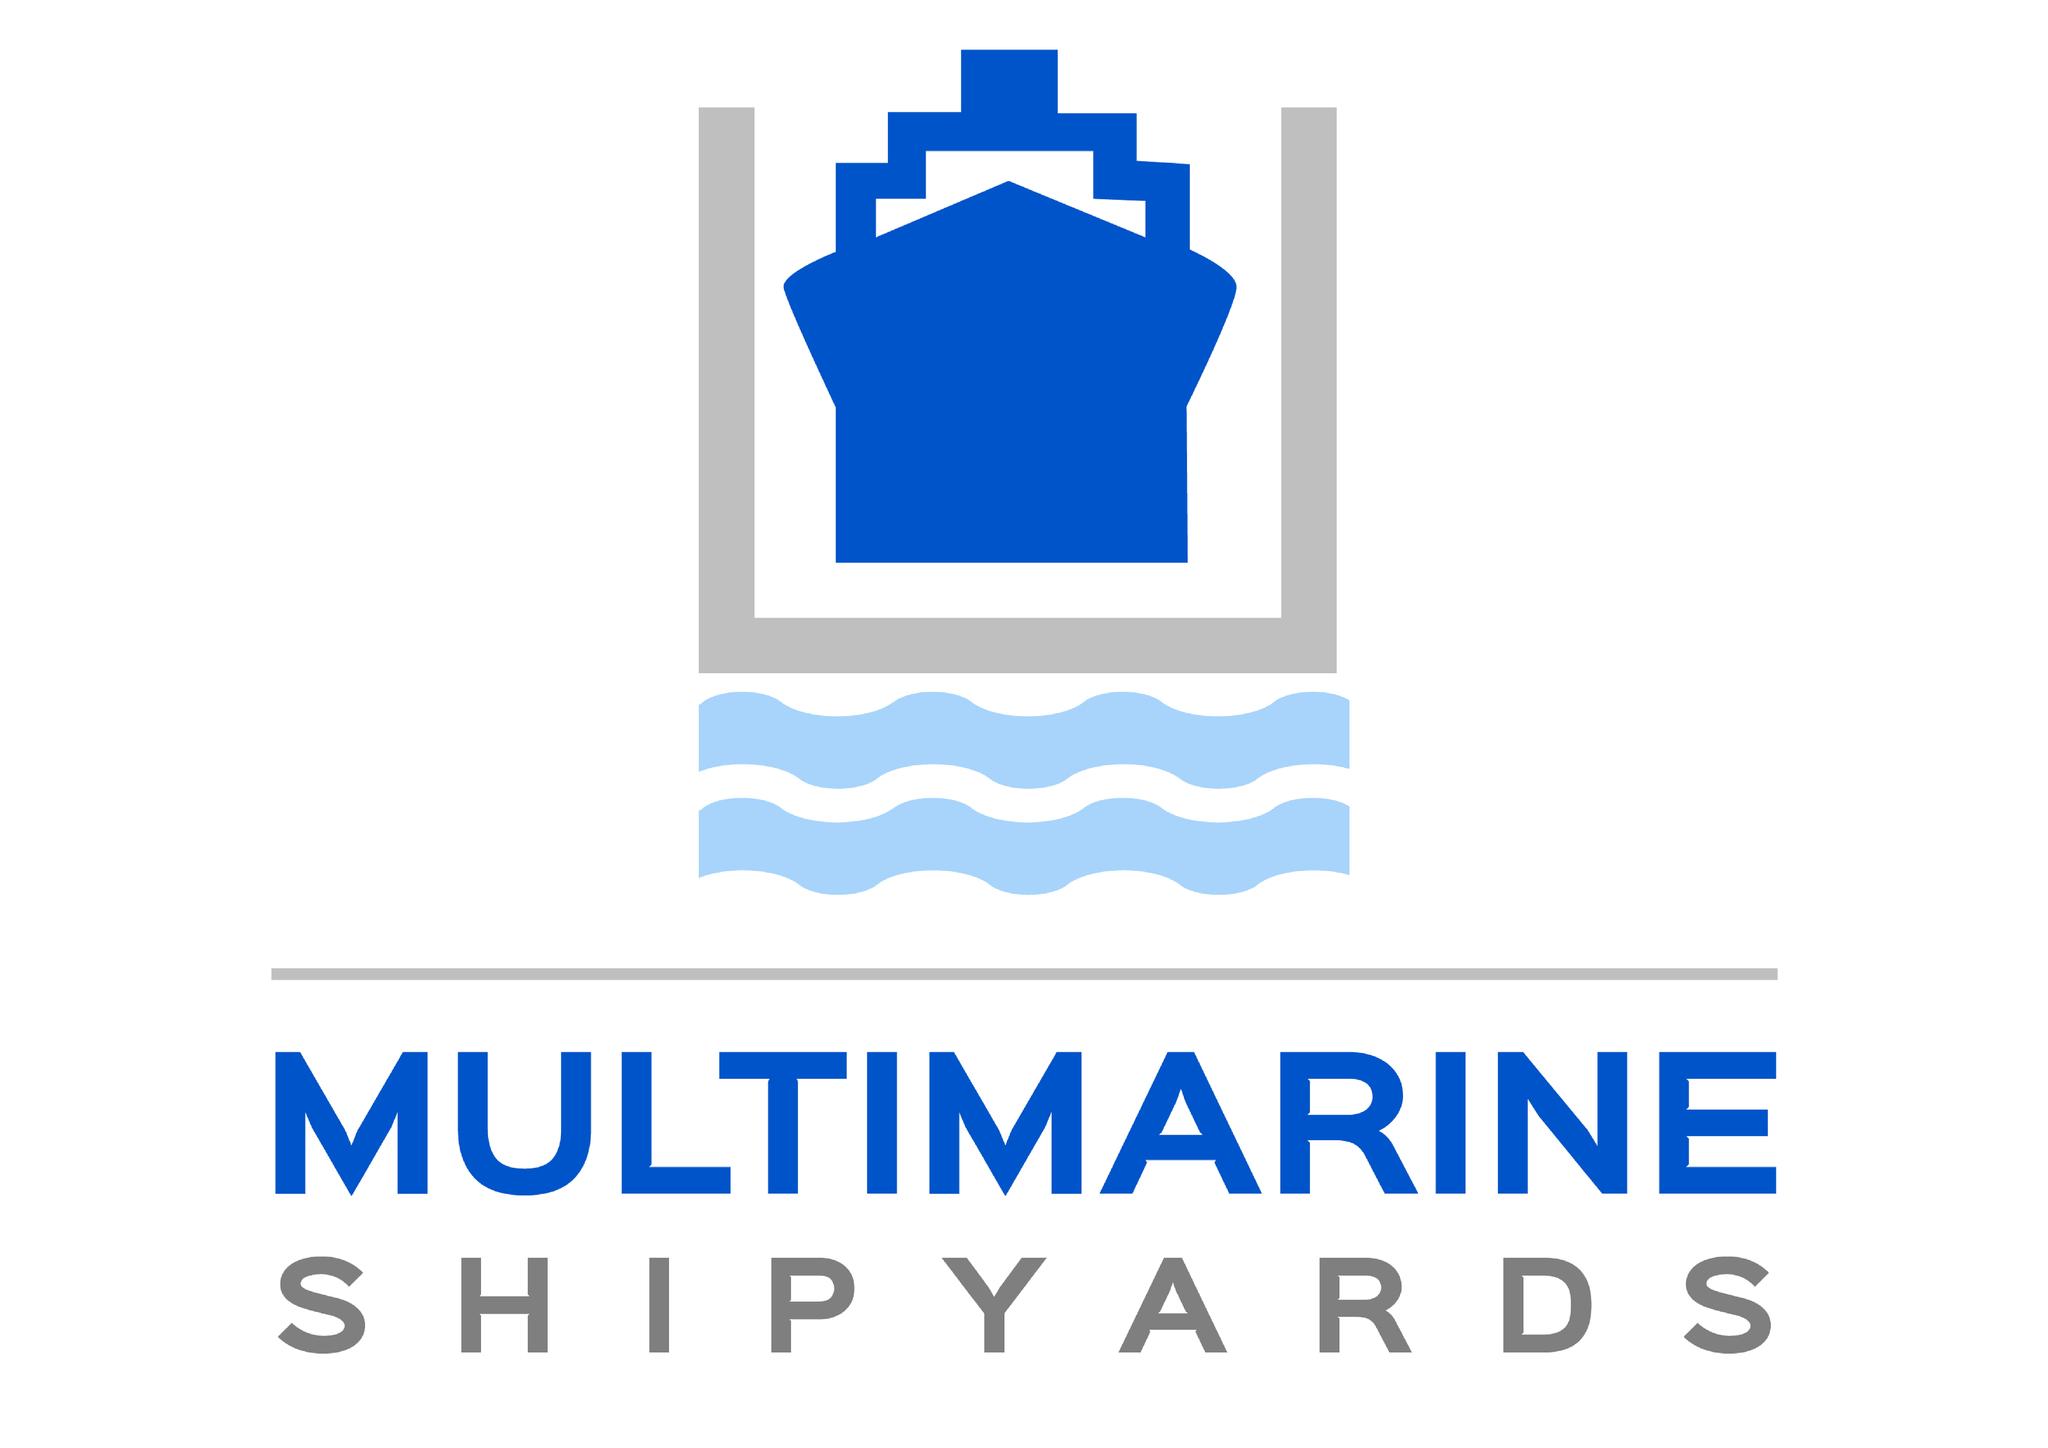 Multimarine Shipyards Ltd.